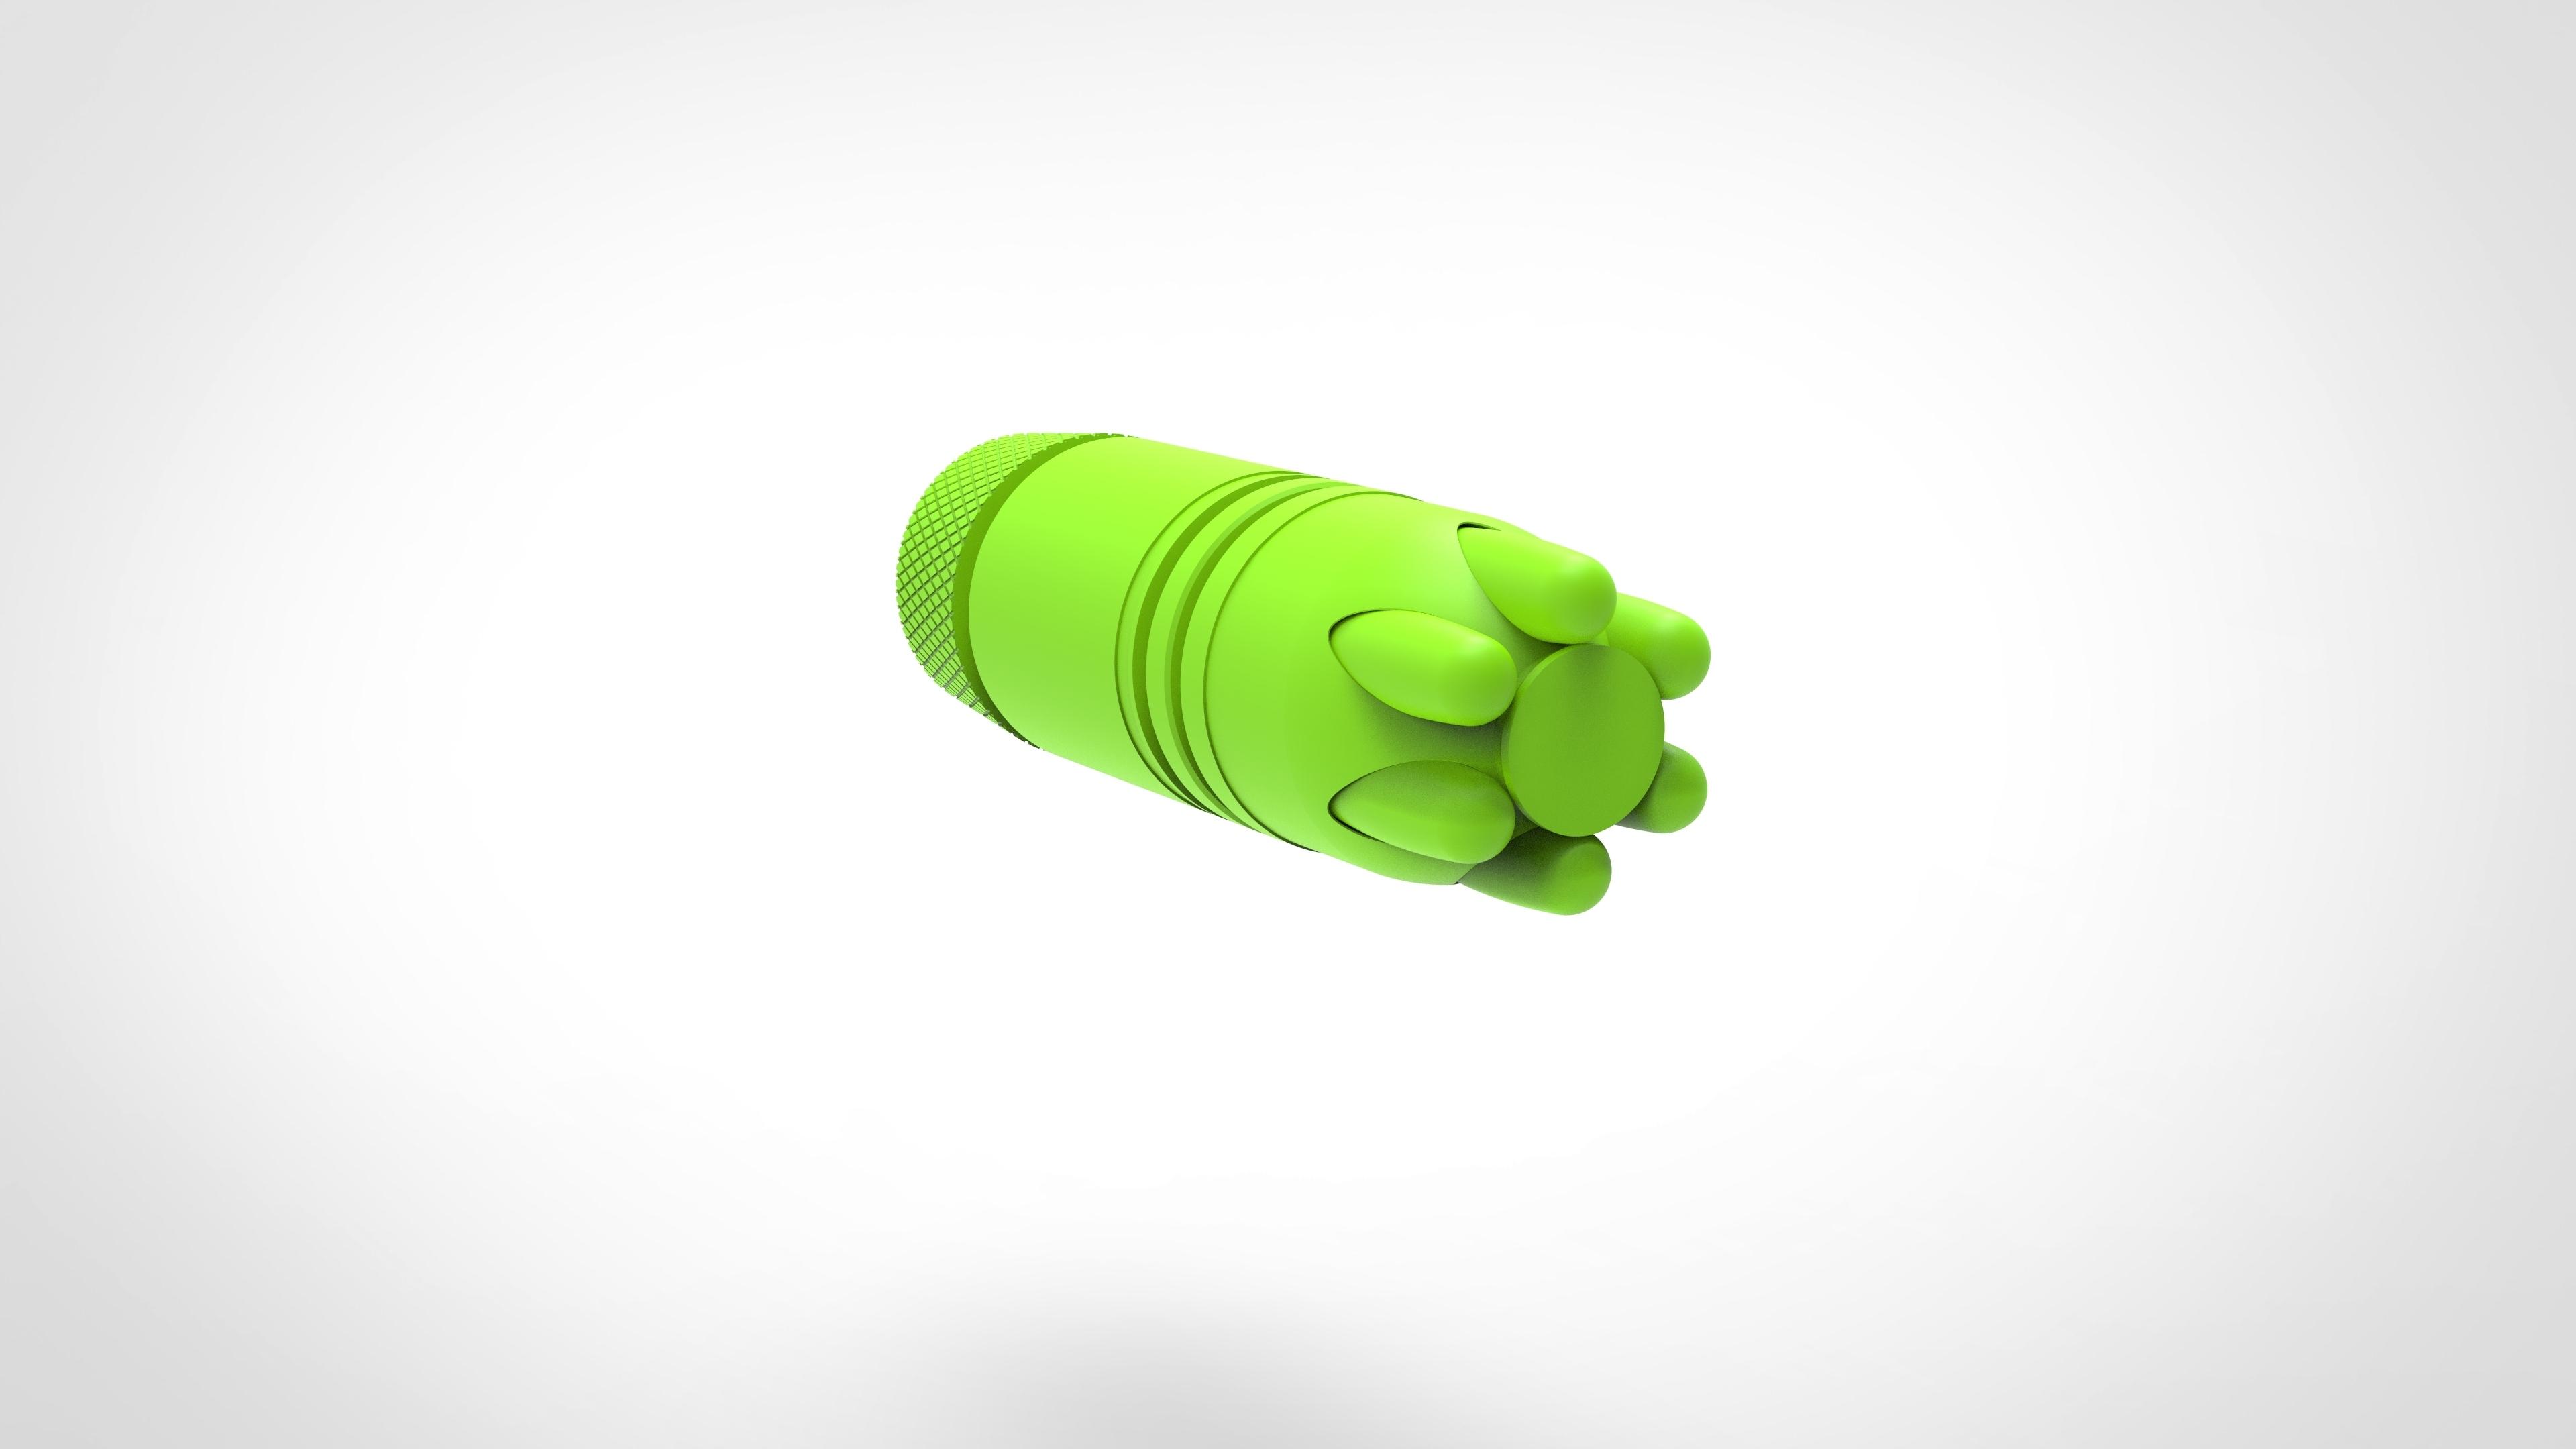 019.jpg Download 3MF file Glue grenade from the video game Batman: Arkham Origins • 3D printer model, vetrock